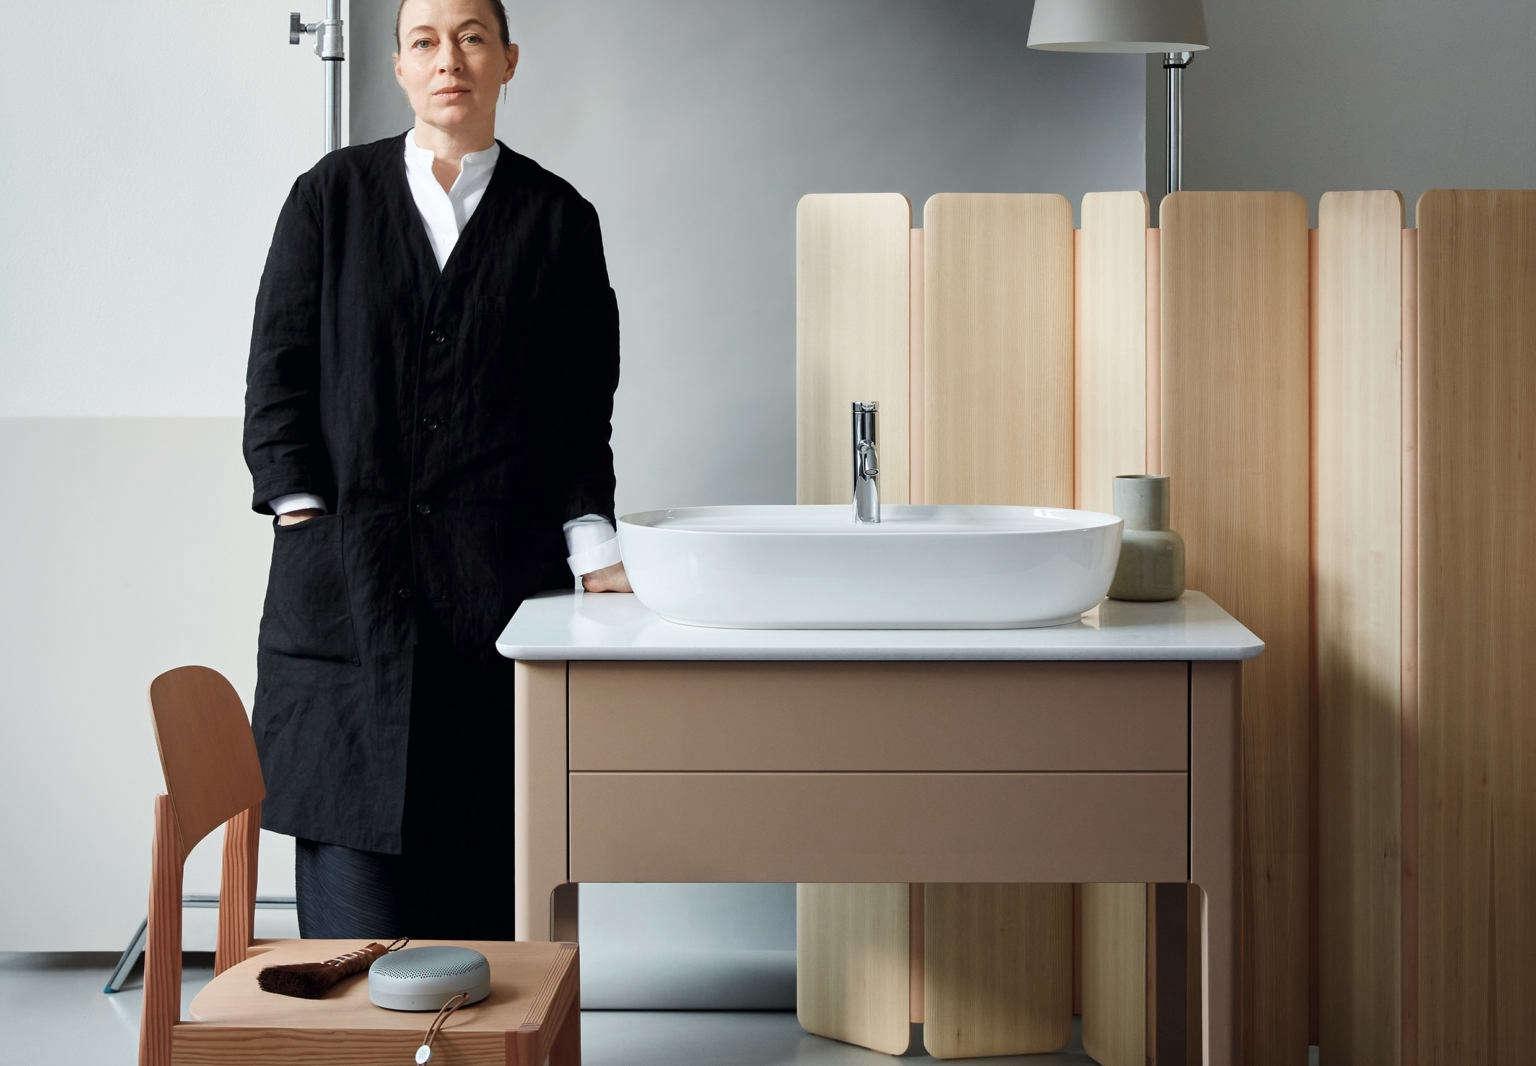 duravit luv bathroom collection by cecelie manz 1 1536x1066